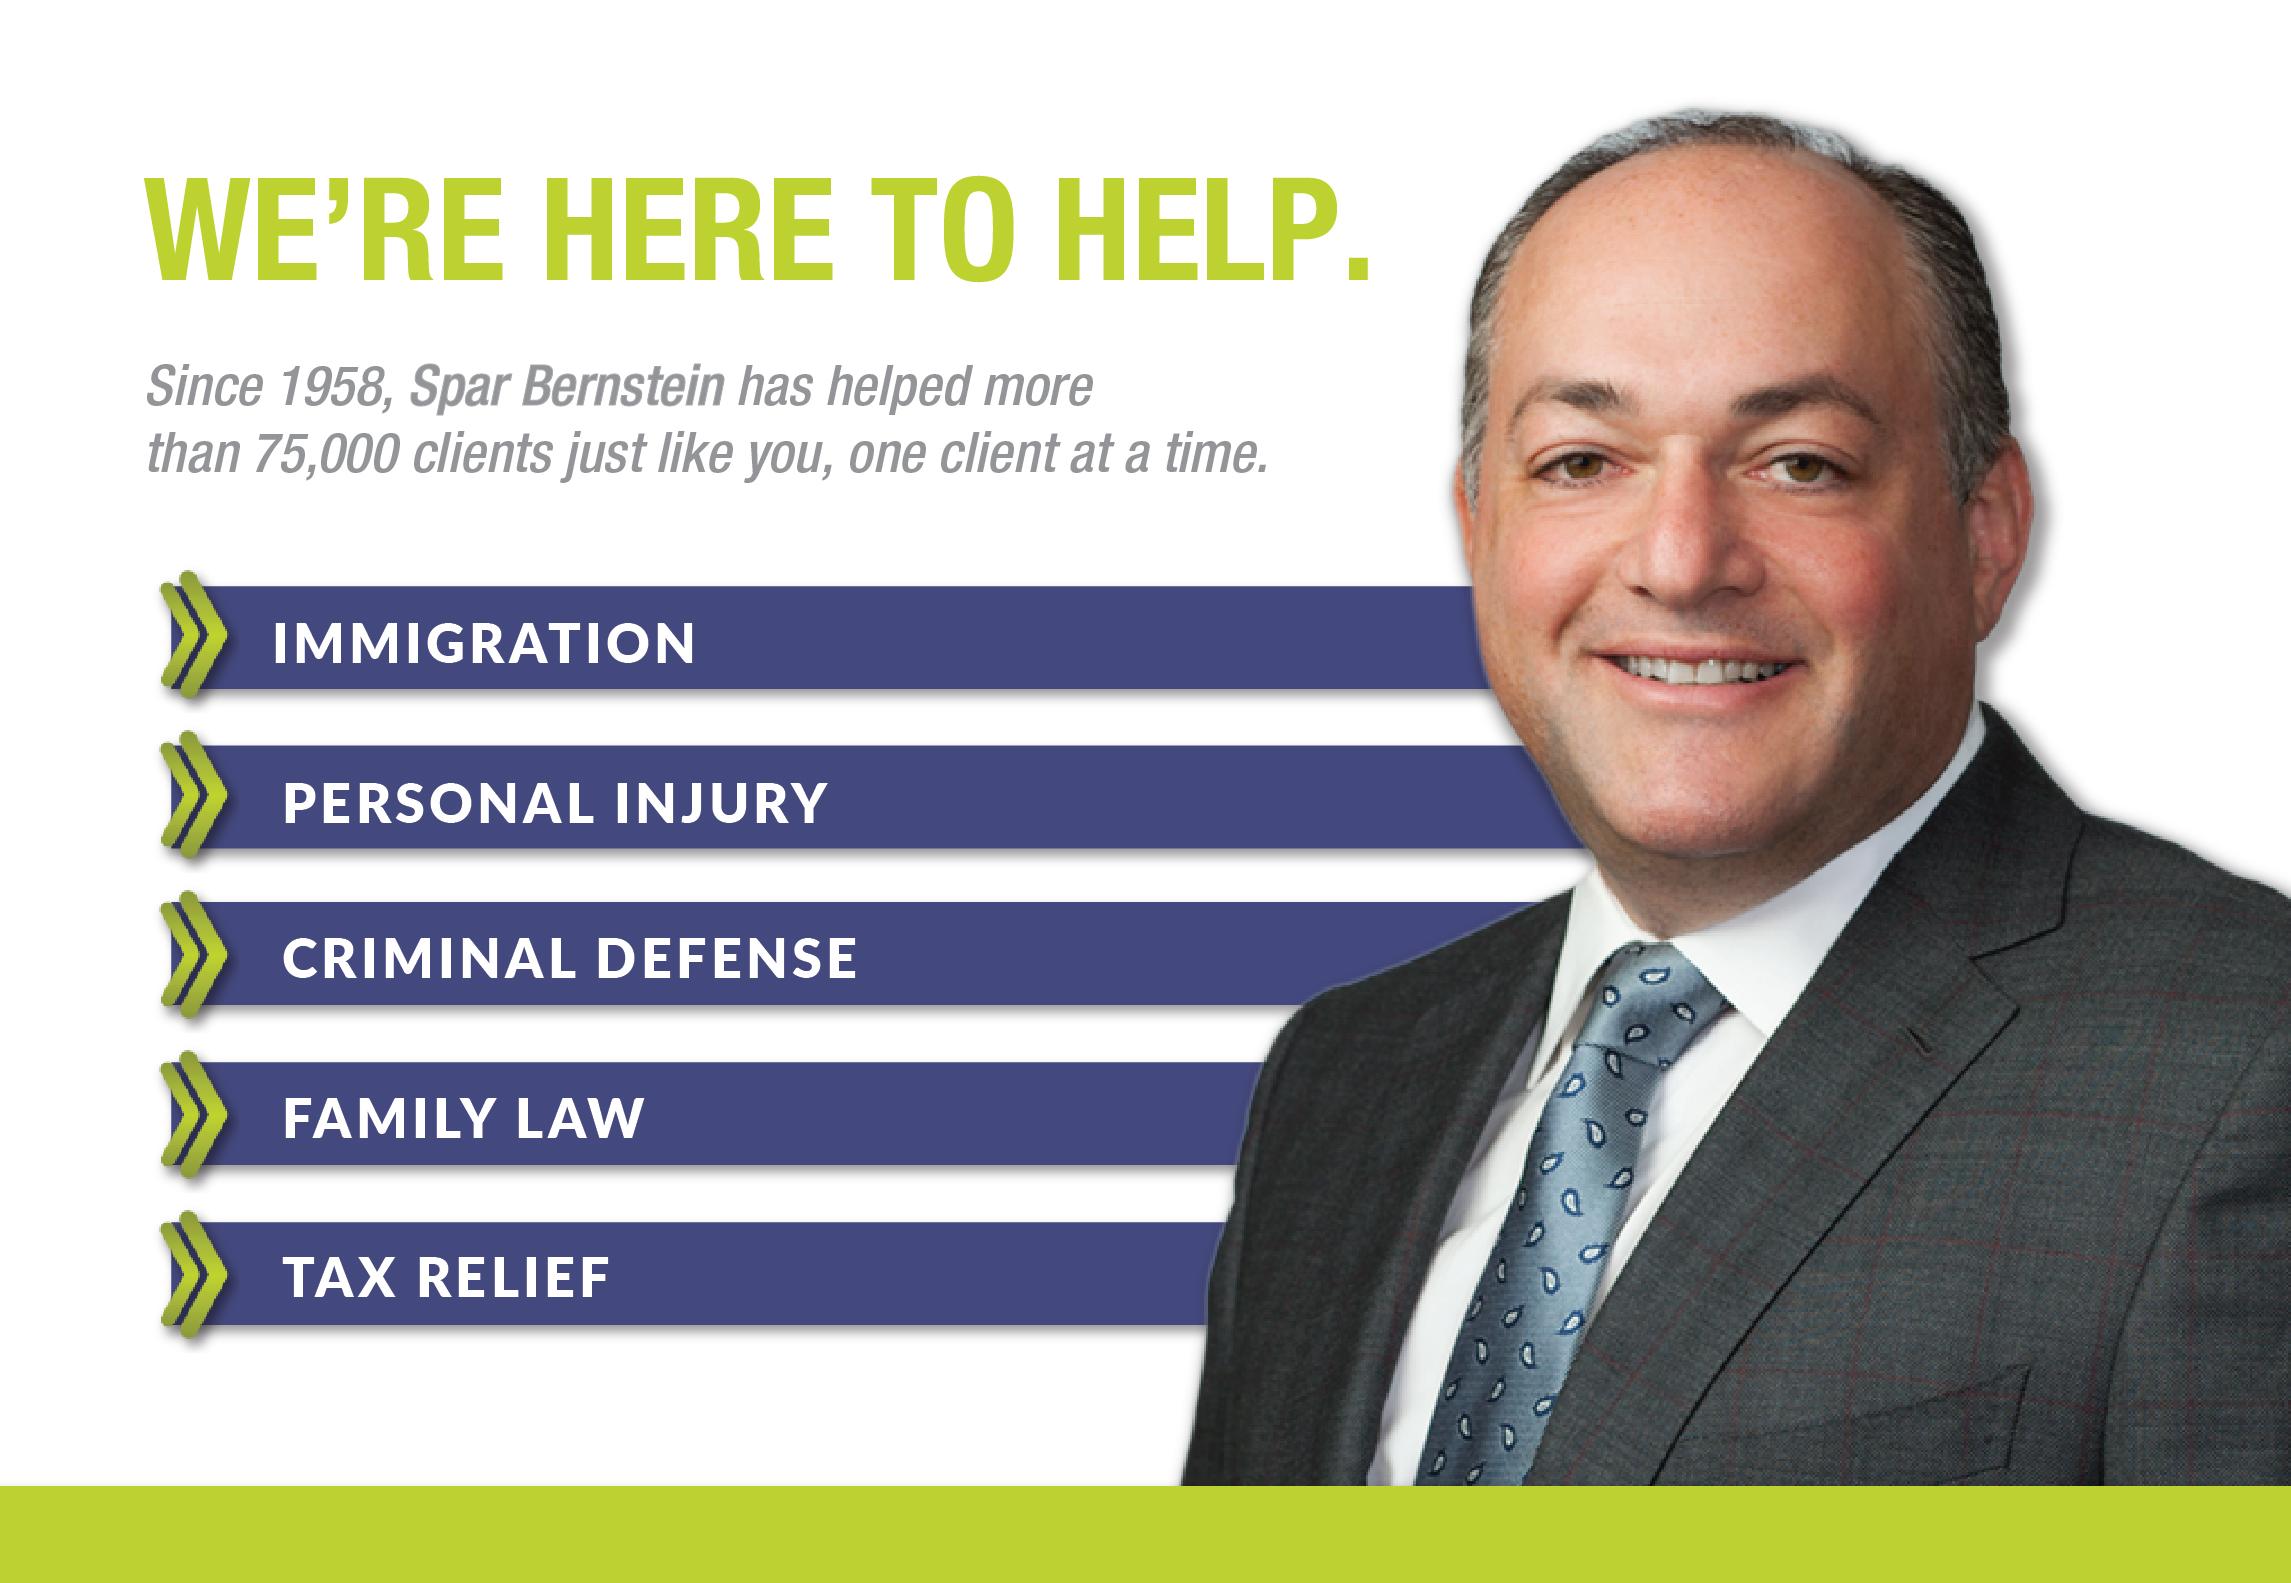 SB_Were-Here-To-Help-01